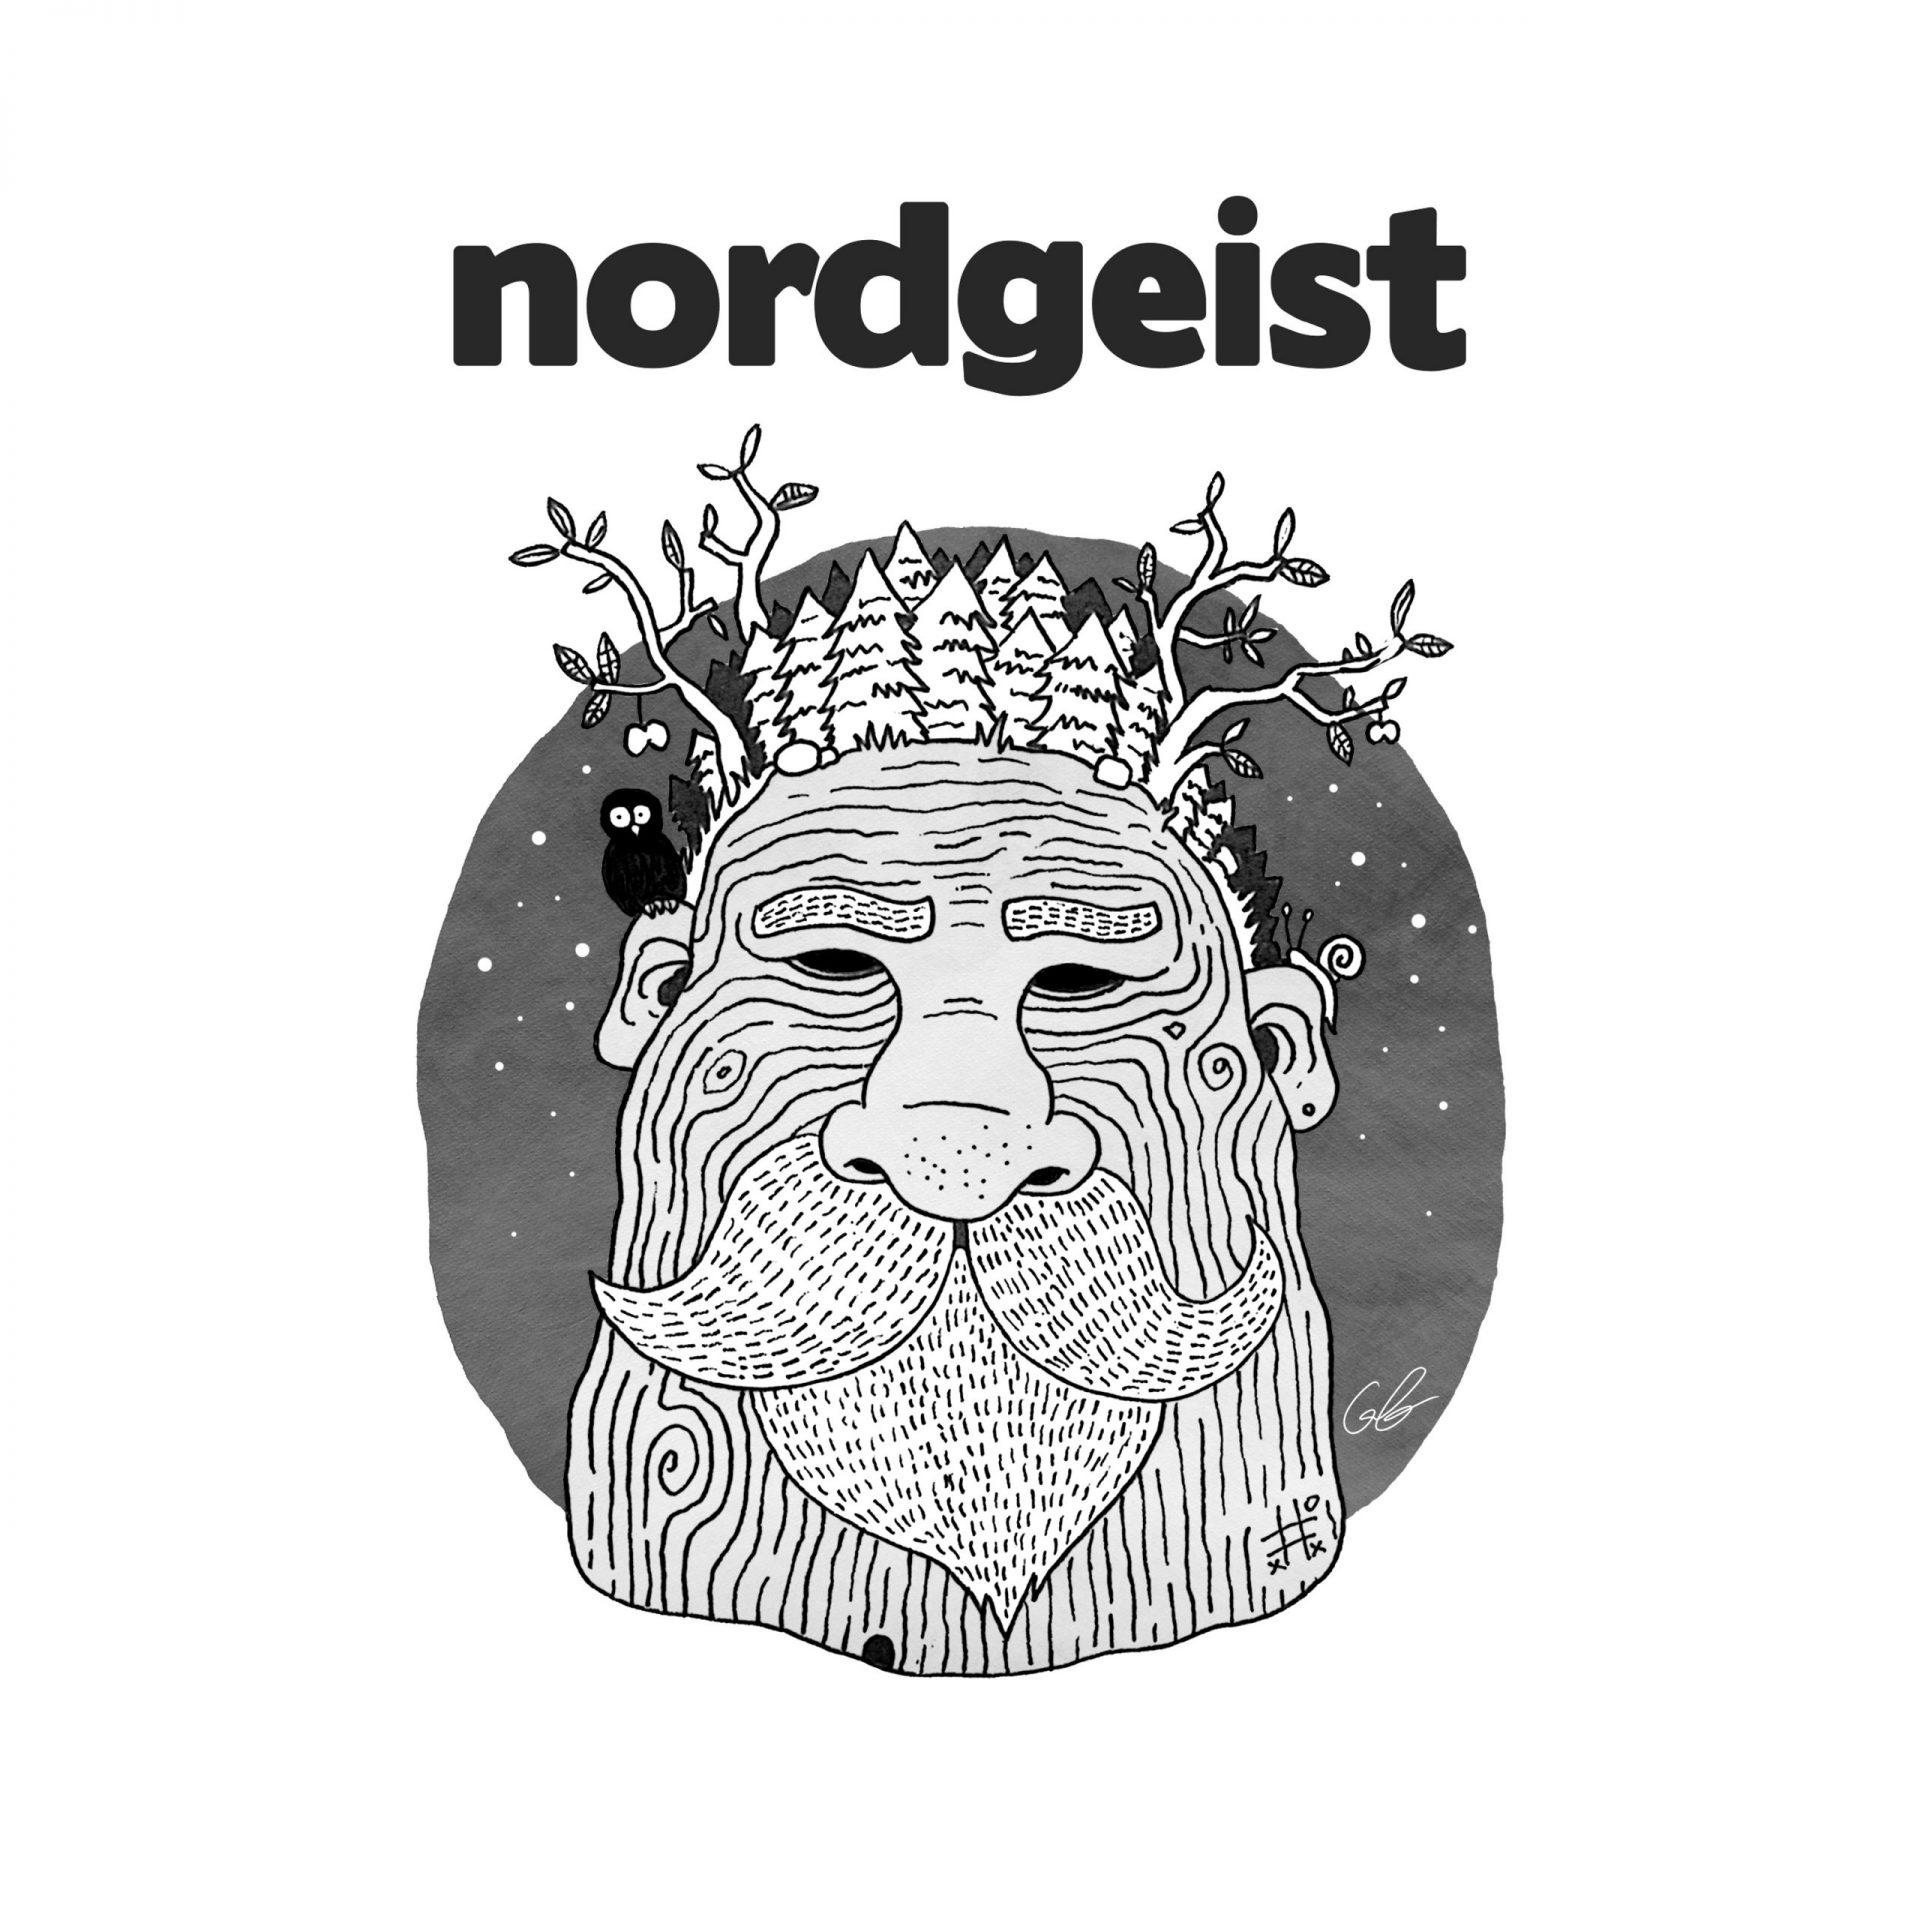 Nordgeister